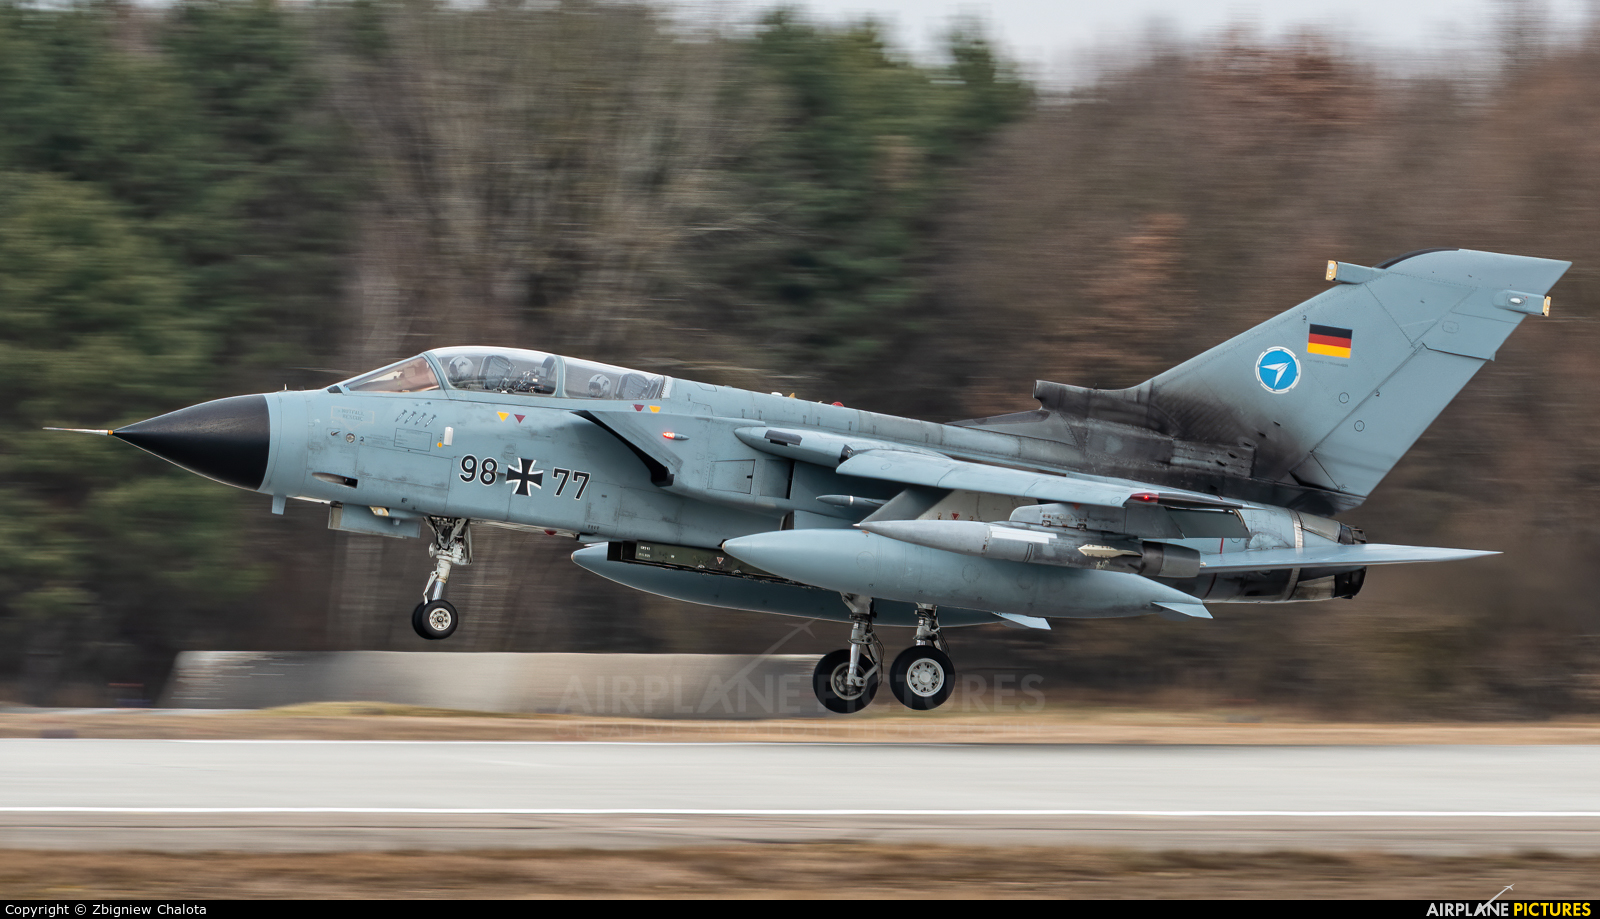 Germany - Air Force 98+77 aircraft at Ingolstadt - Manching